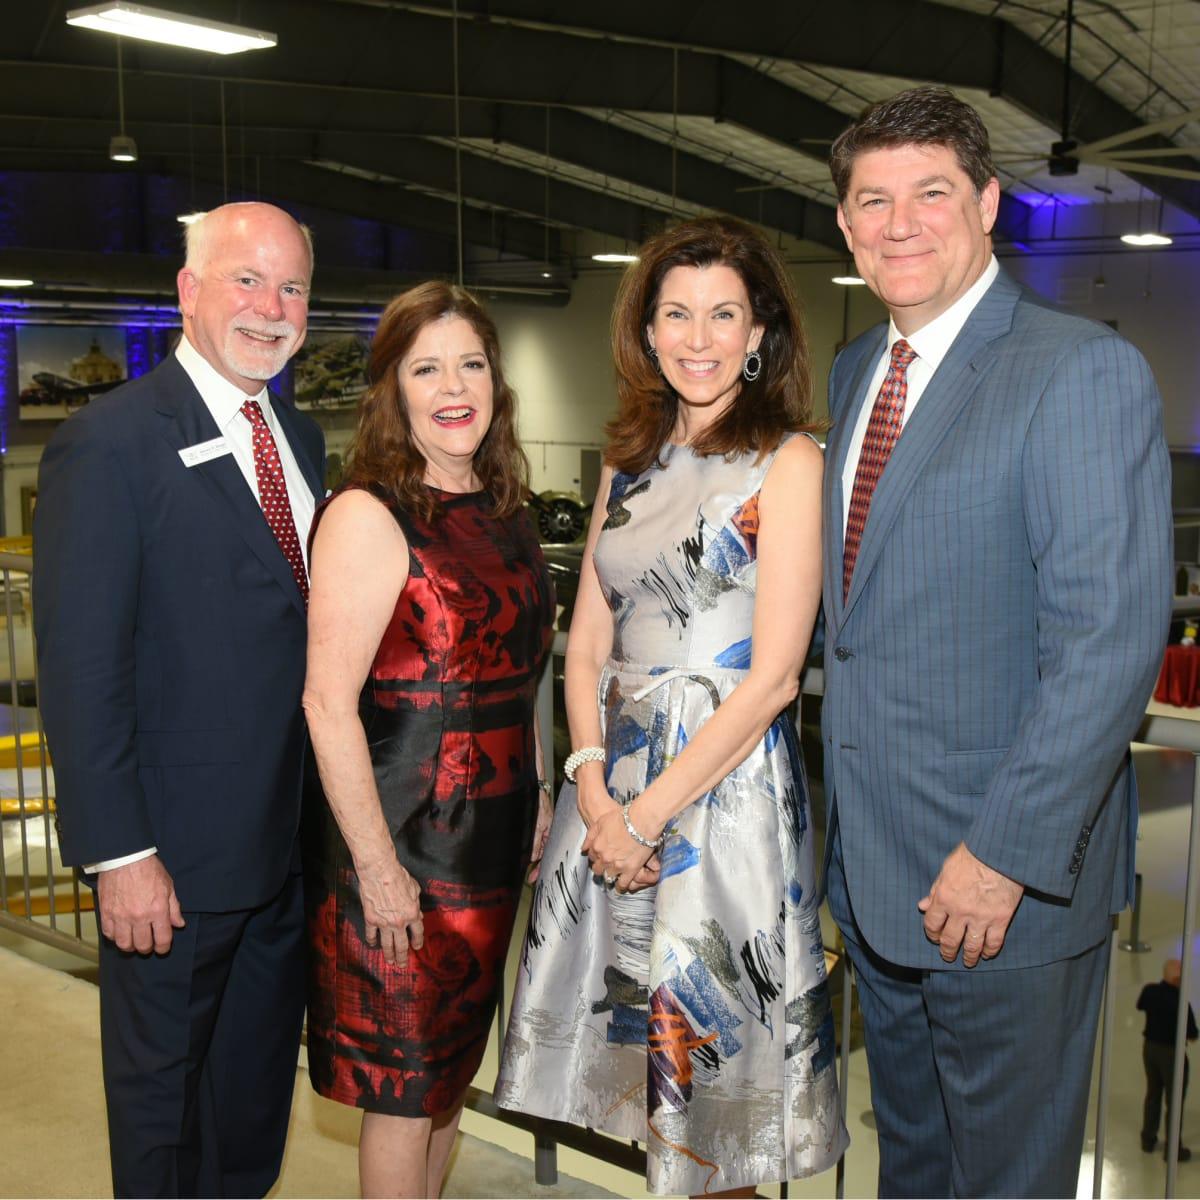 Flight Museum Gala Steve Biegel, Diane Biegel, Lisa Sherrill Russell Sherrill